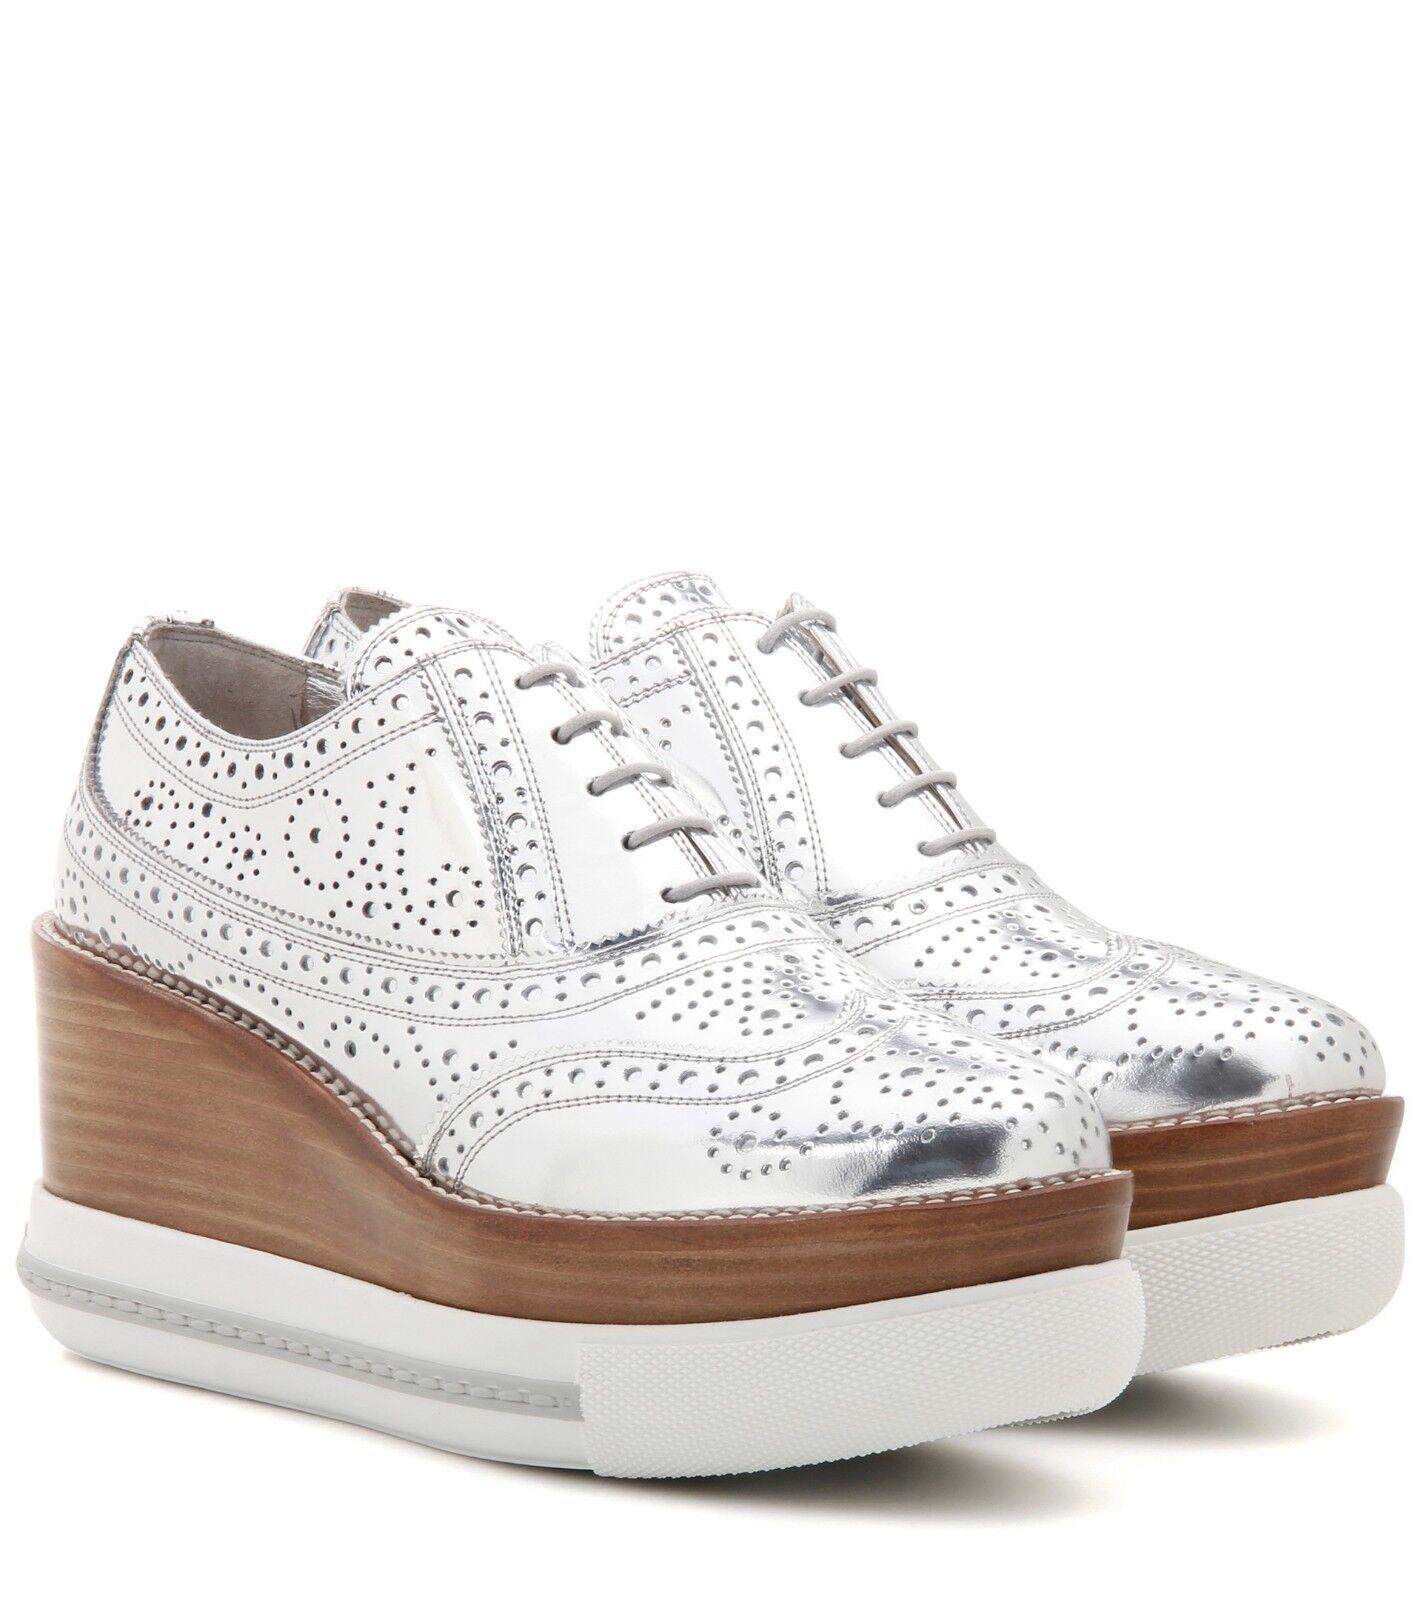 Miu Miu PRADA SEXY Plata PLATFORM Oxfords Oxfords Oxfords SNEAKERS I LOVE Zapatos bf2e4c